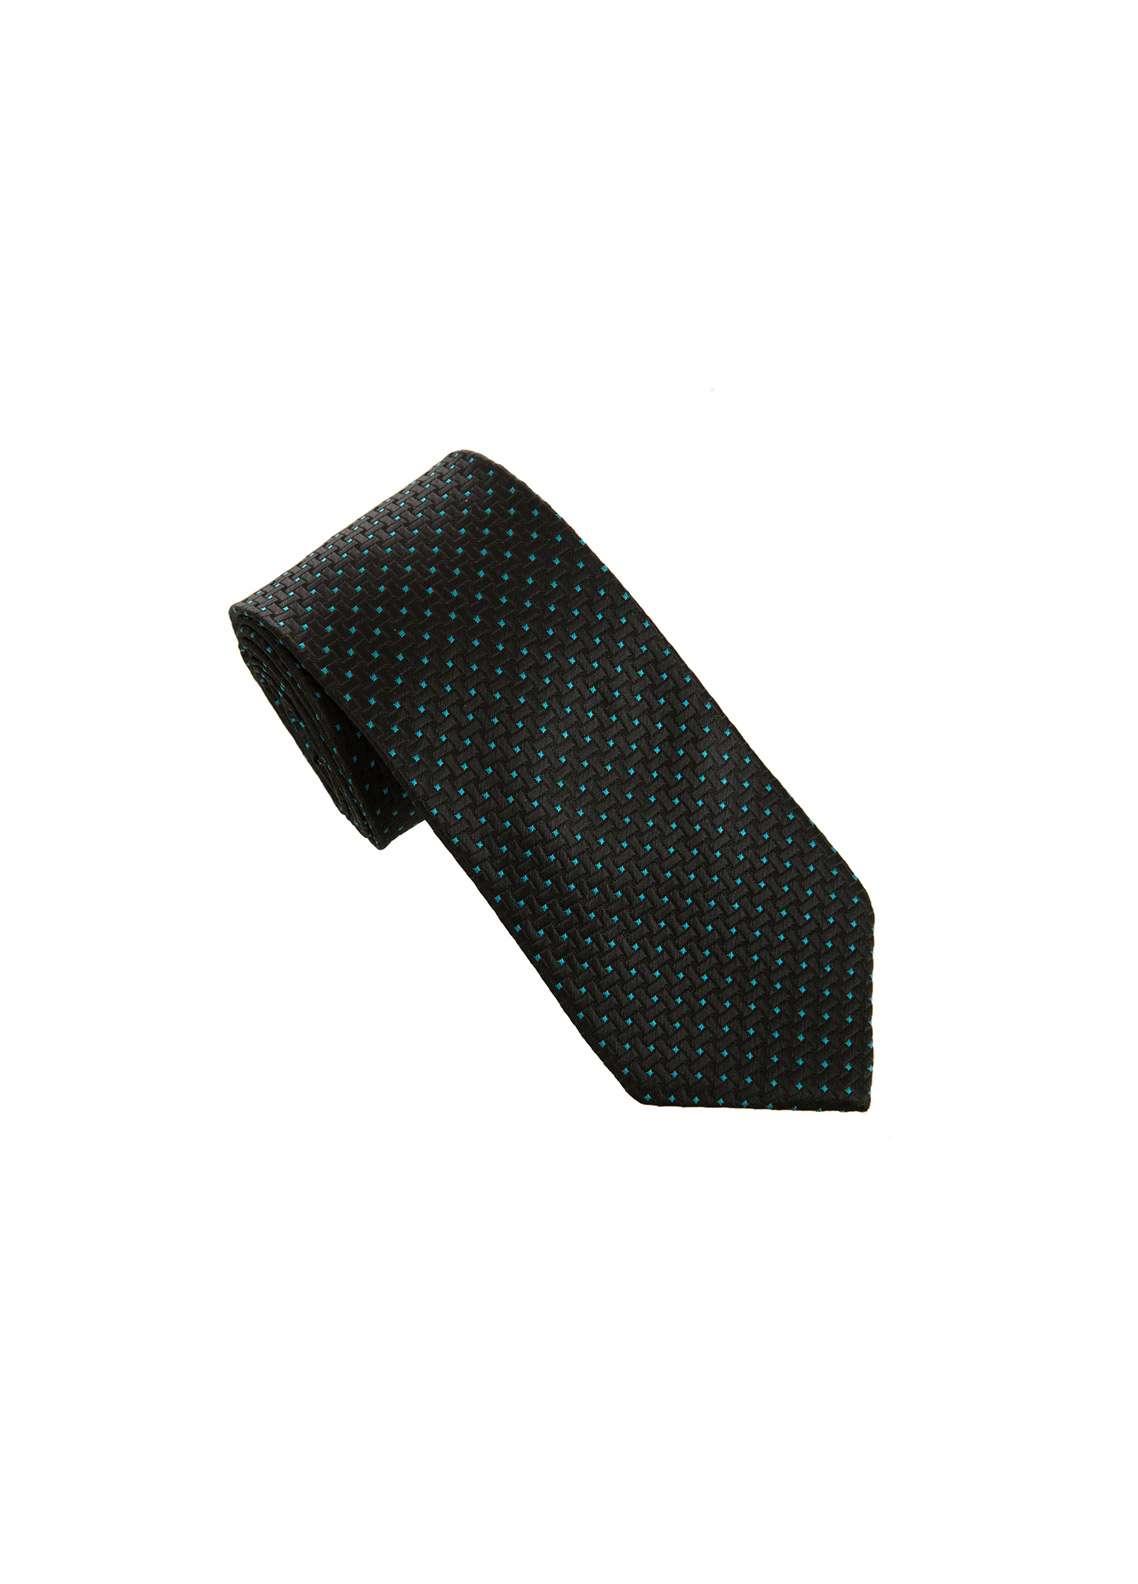 The Gentlemen's Club Black Polka Dotted Silk Tie for Men